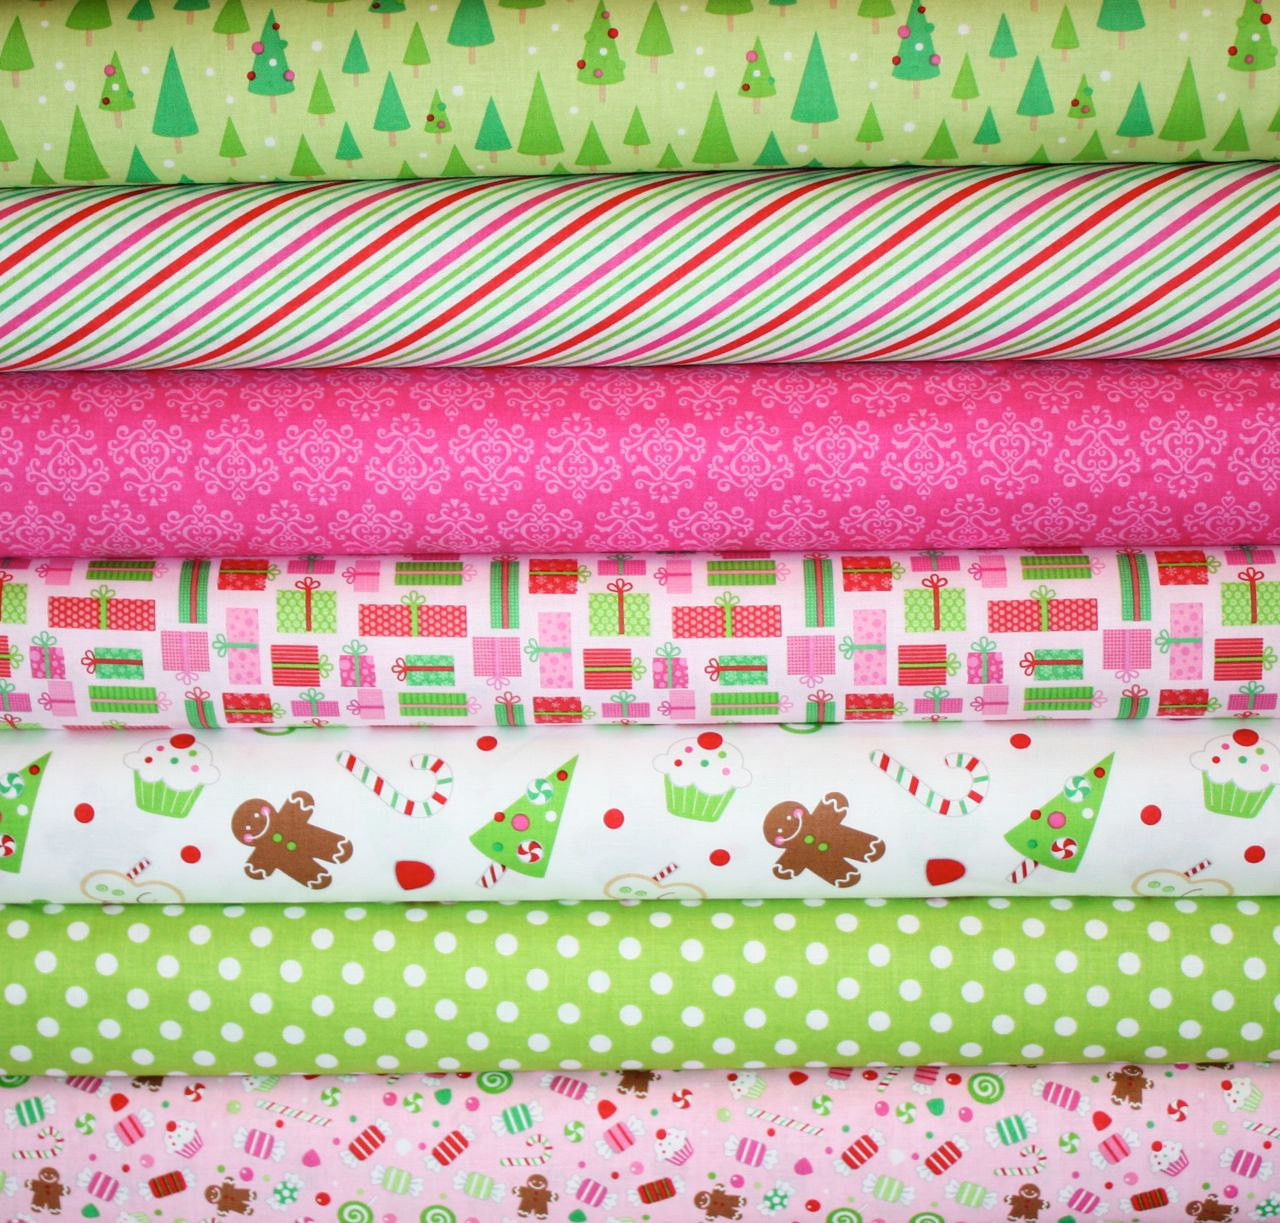 Christmas Candy Fabric  Candy Christmas Fabric by Doodlebug Designs for Riley Blake